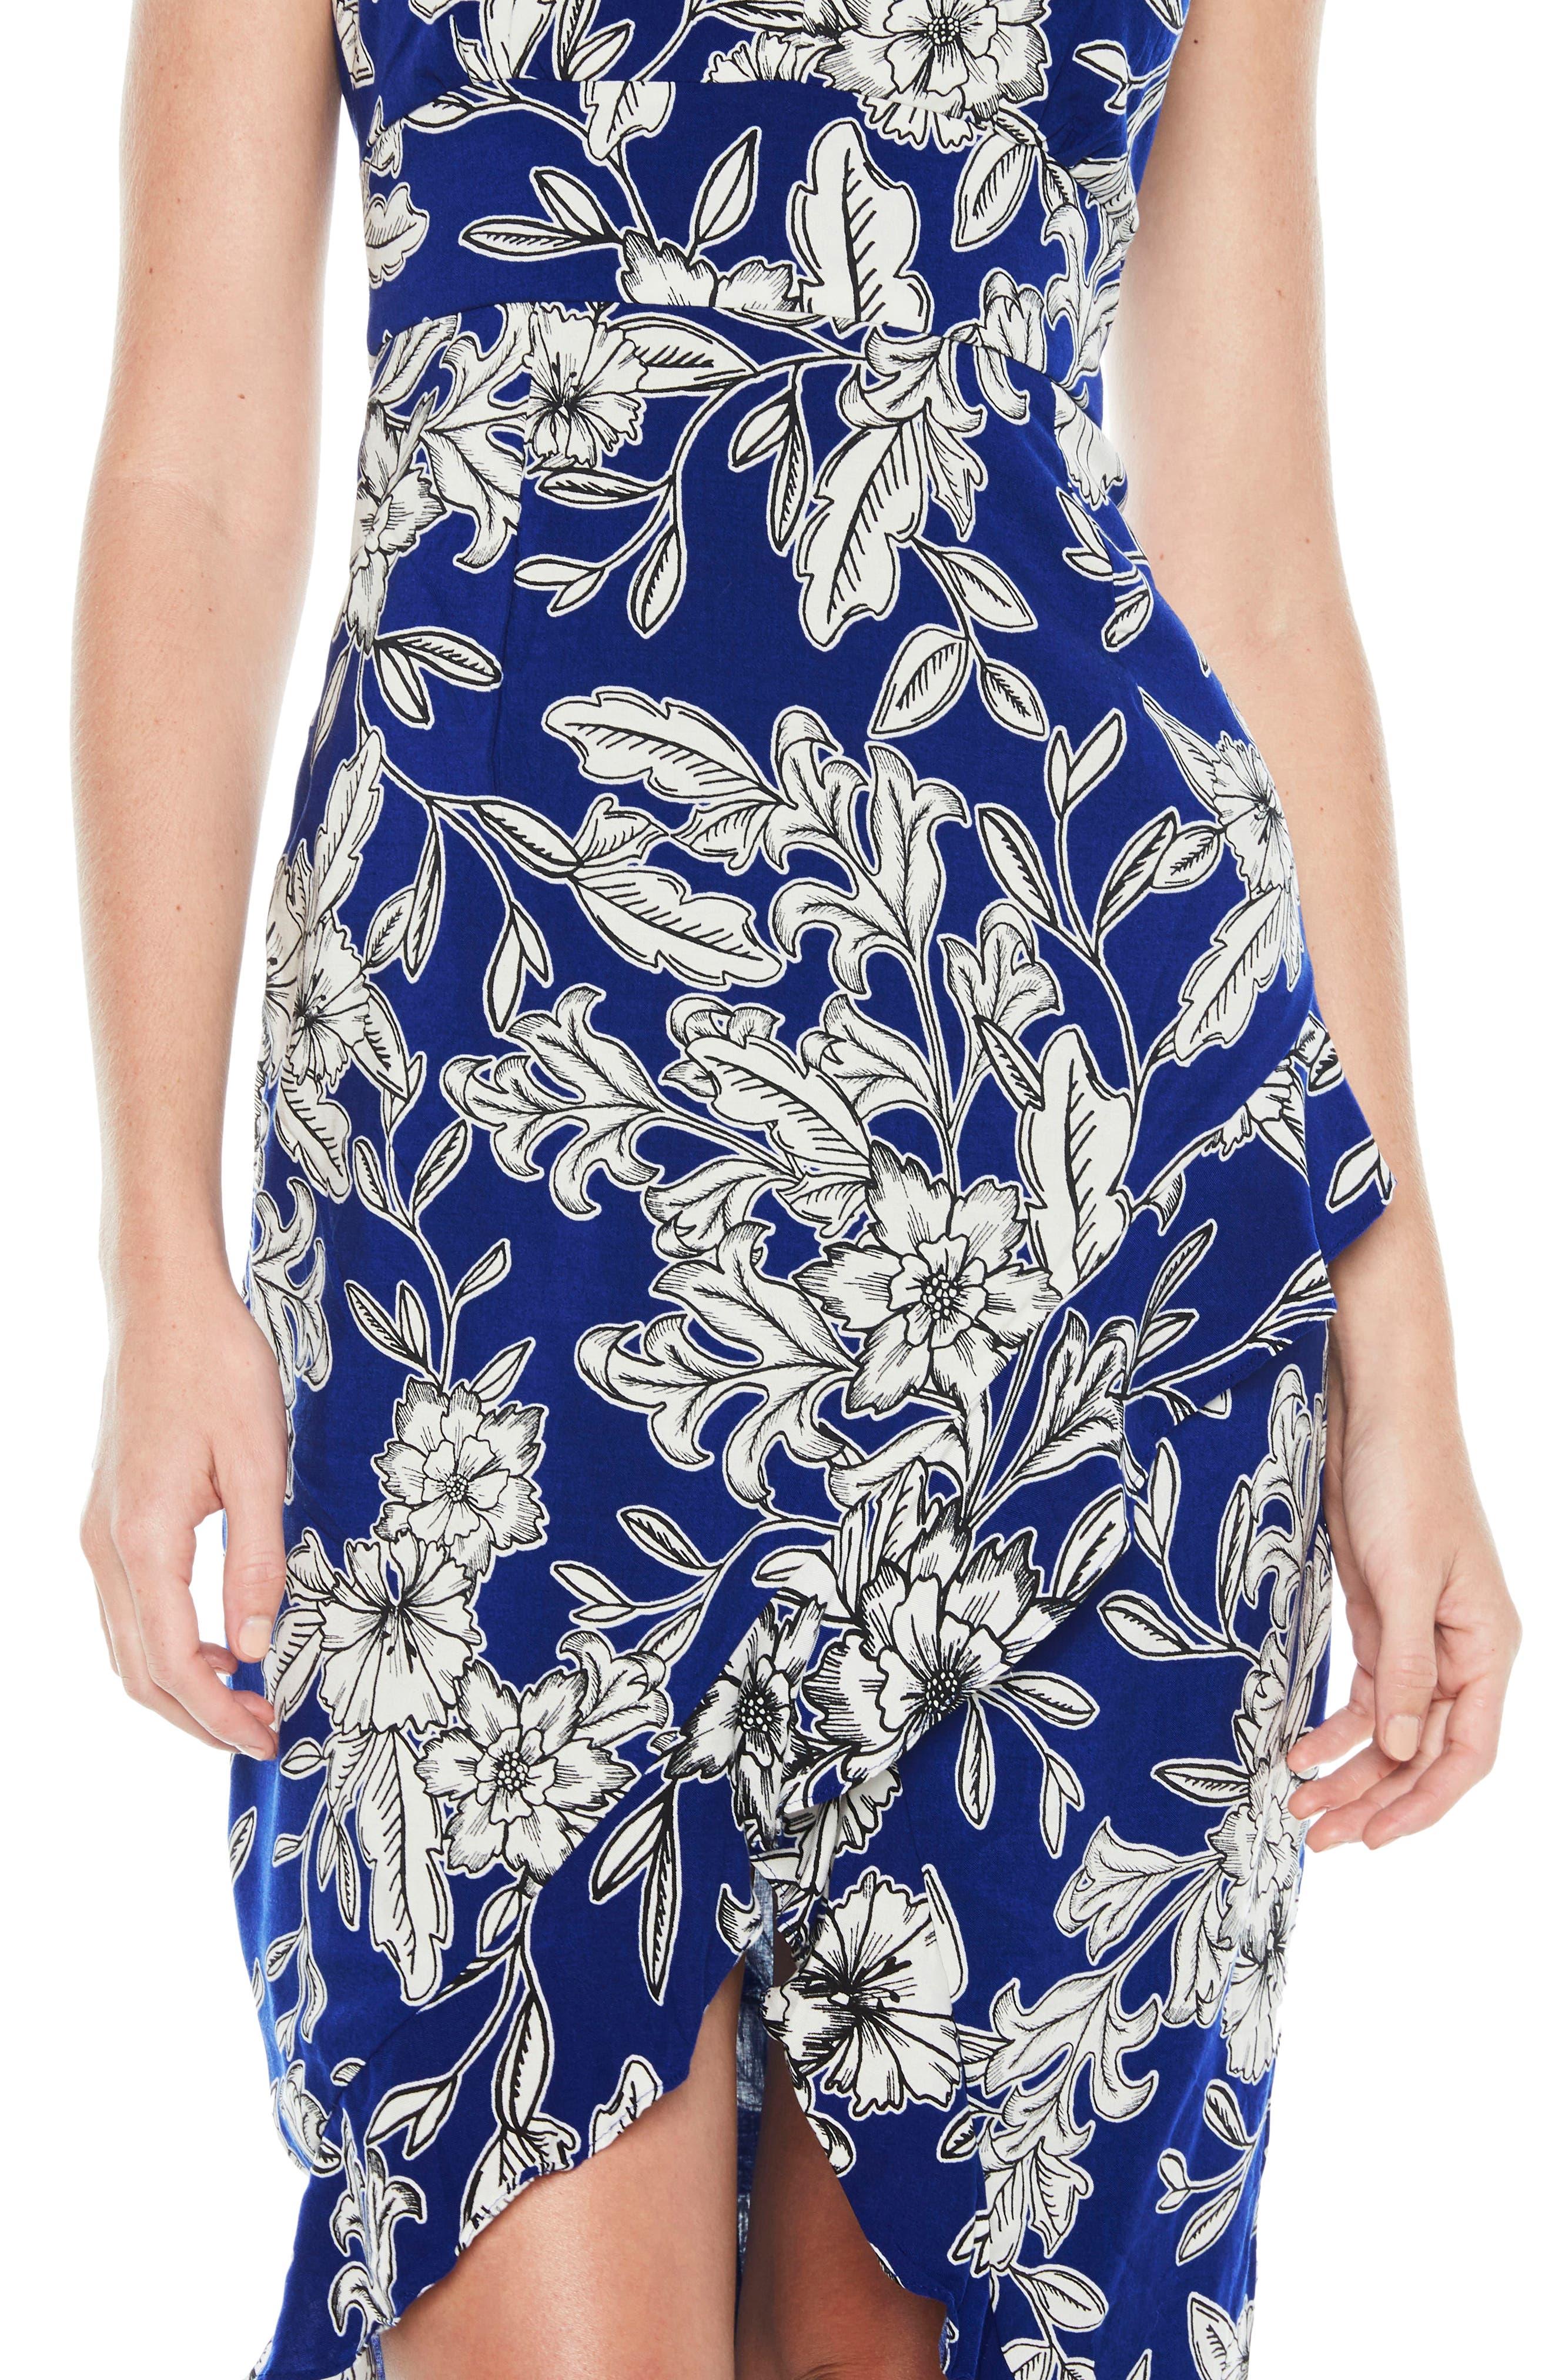 Petra Floral Dress,                             Alternate thumbnail 4, color,                             493